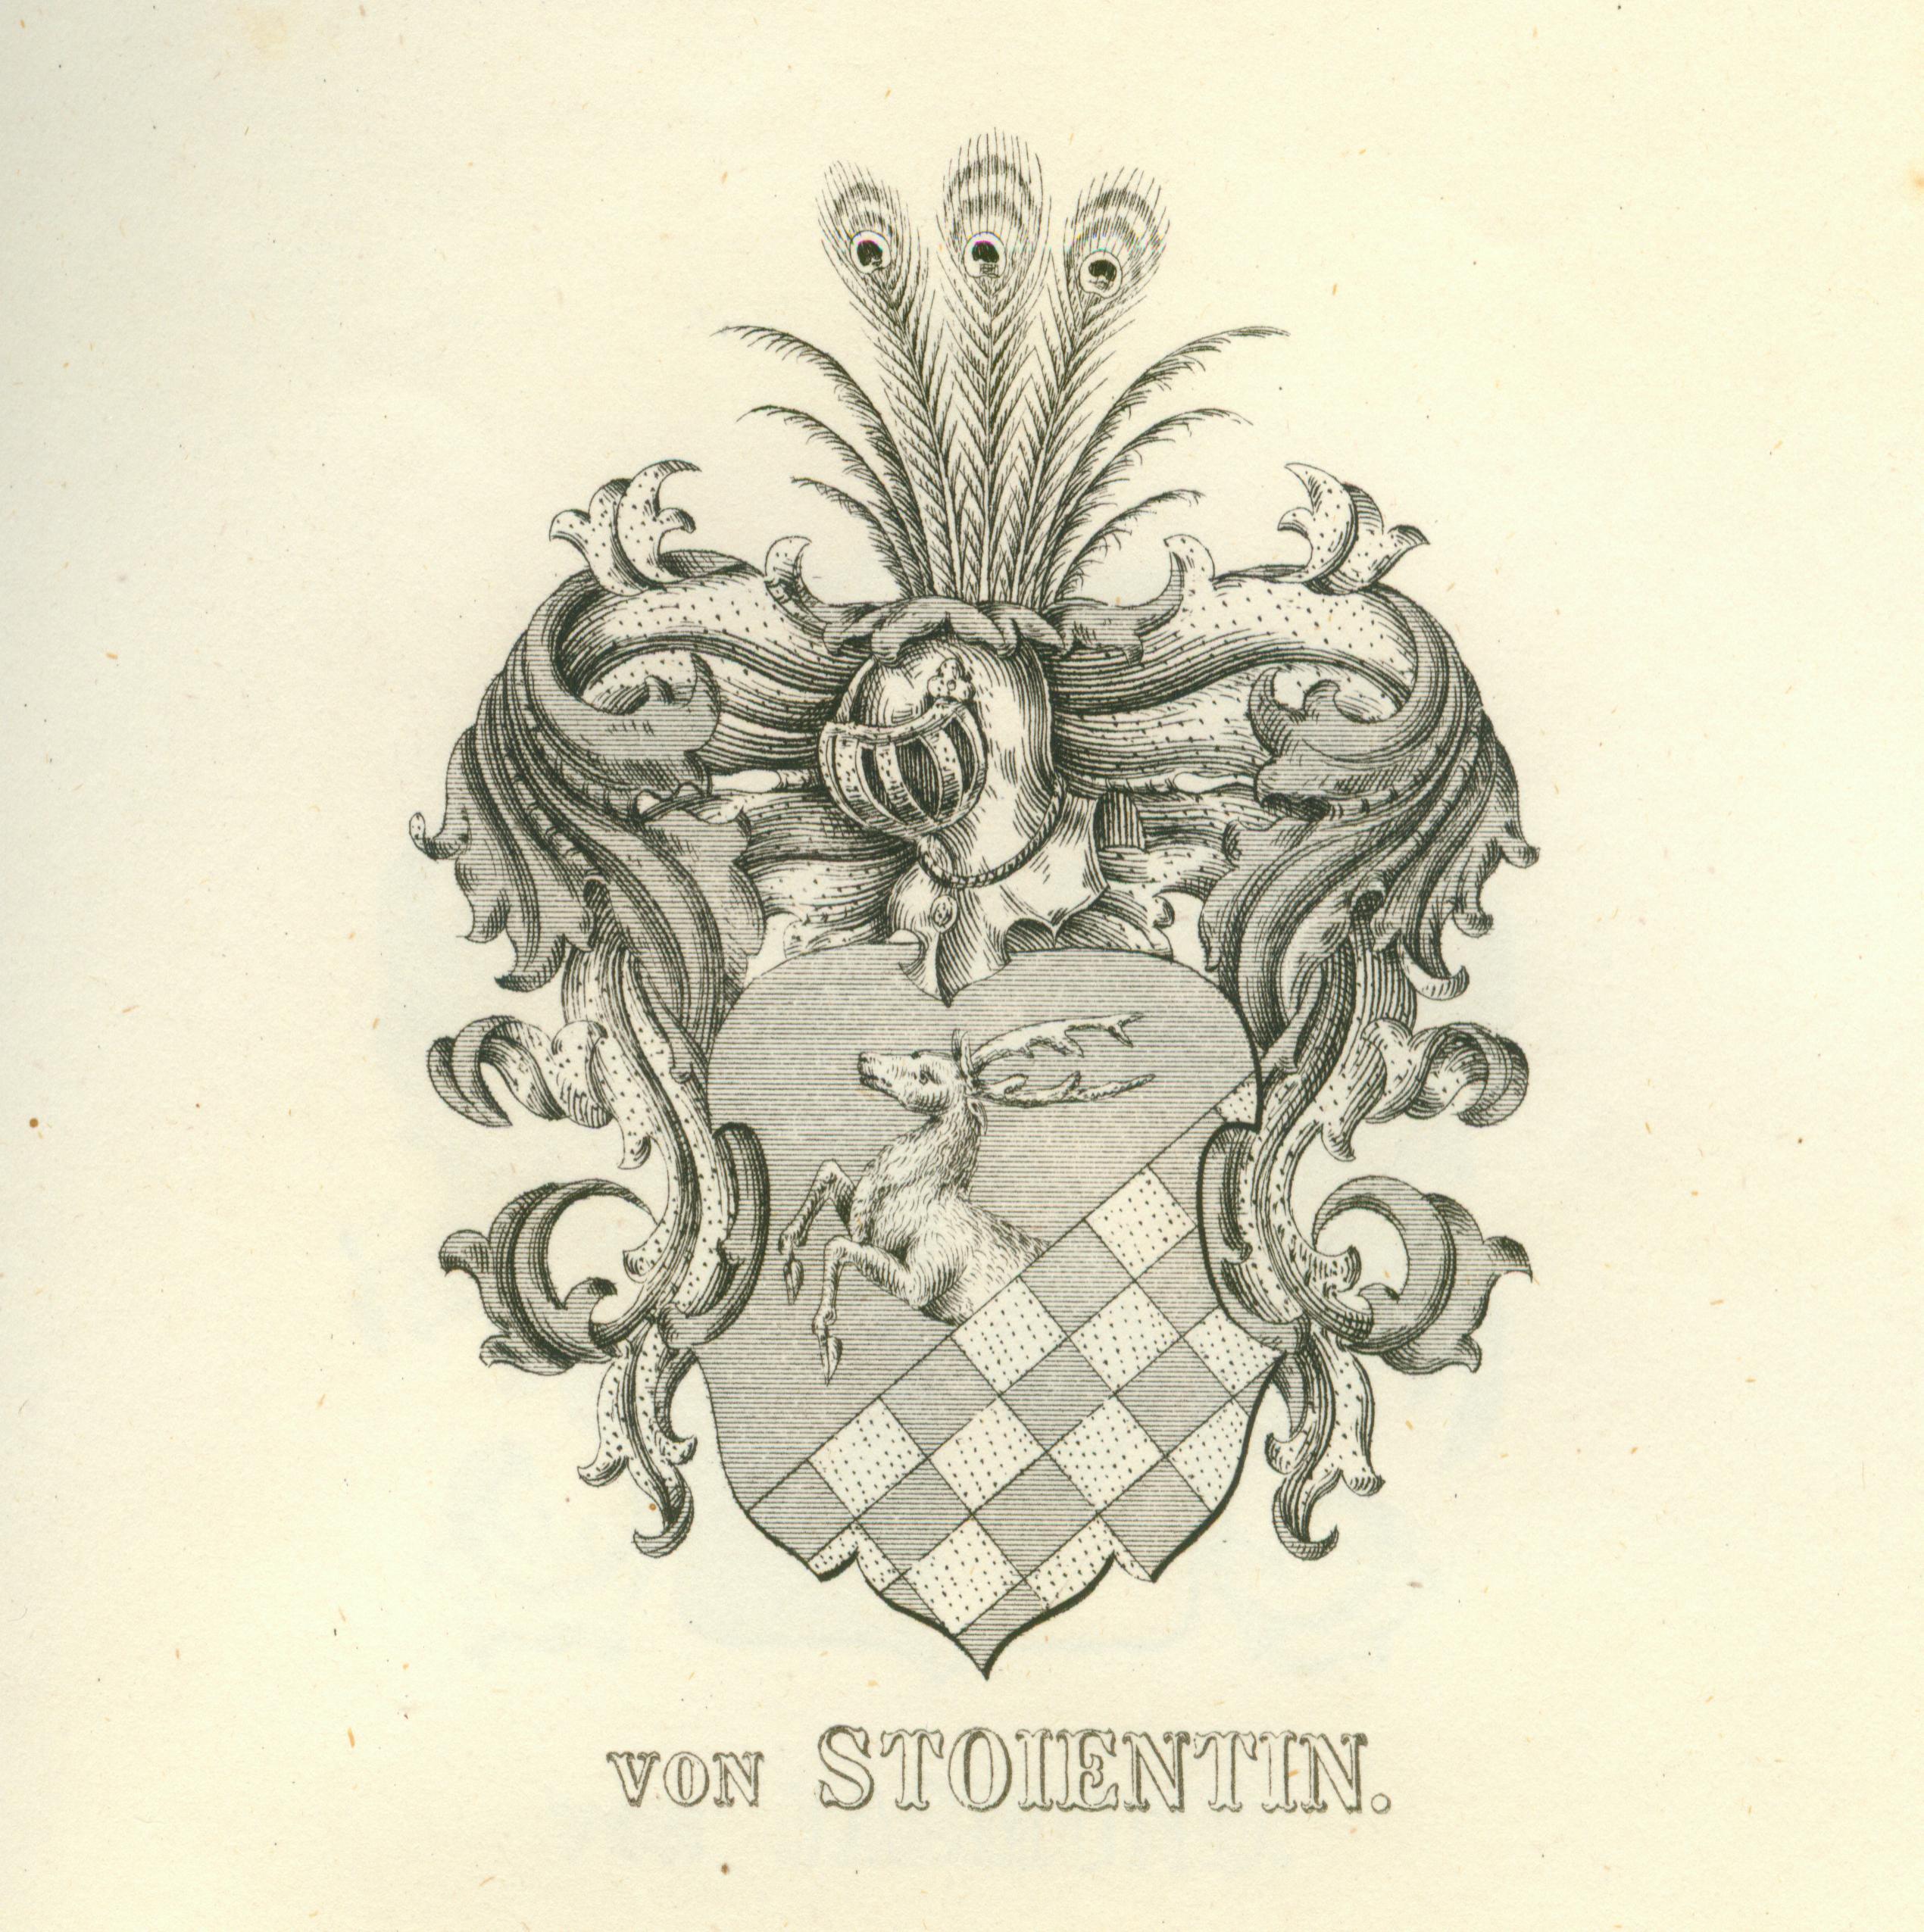 Stoientin